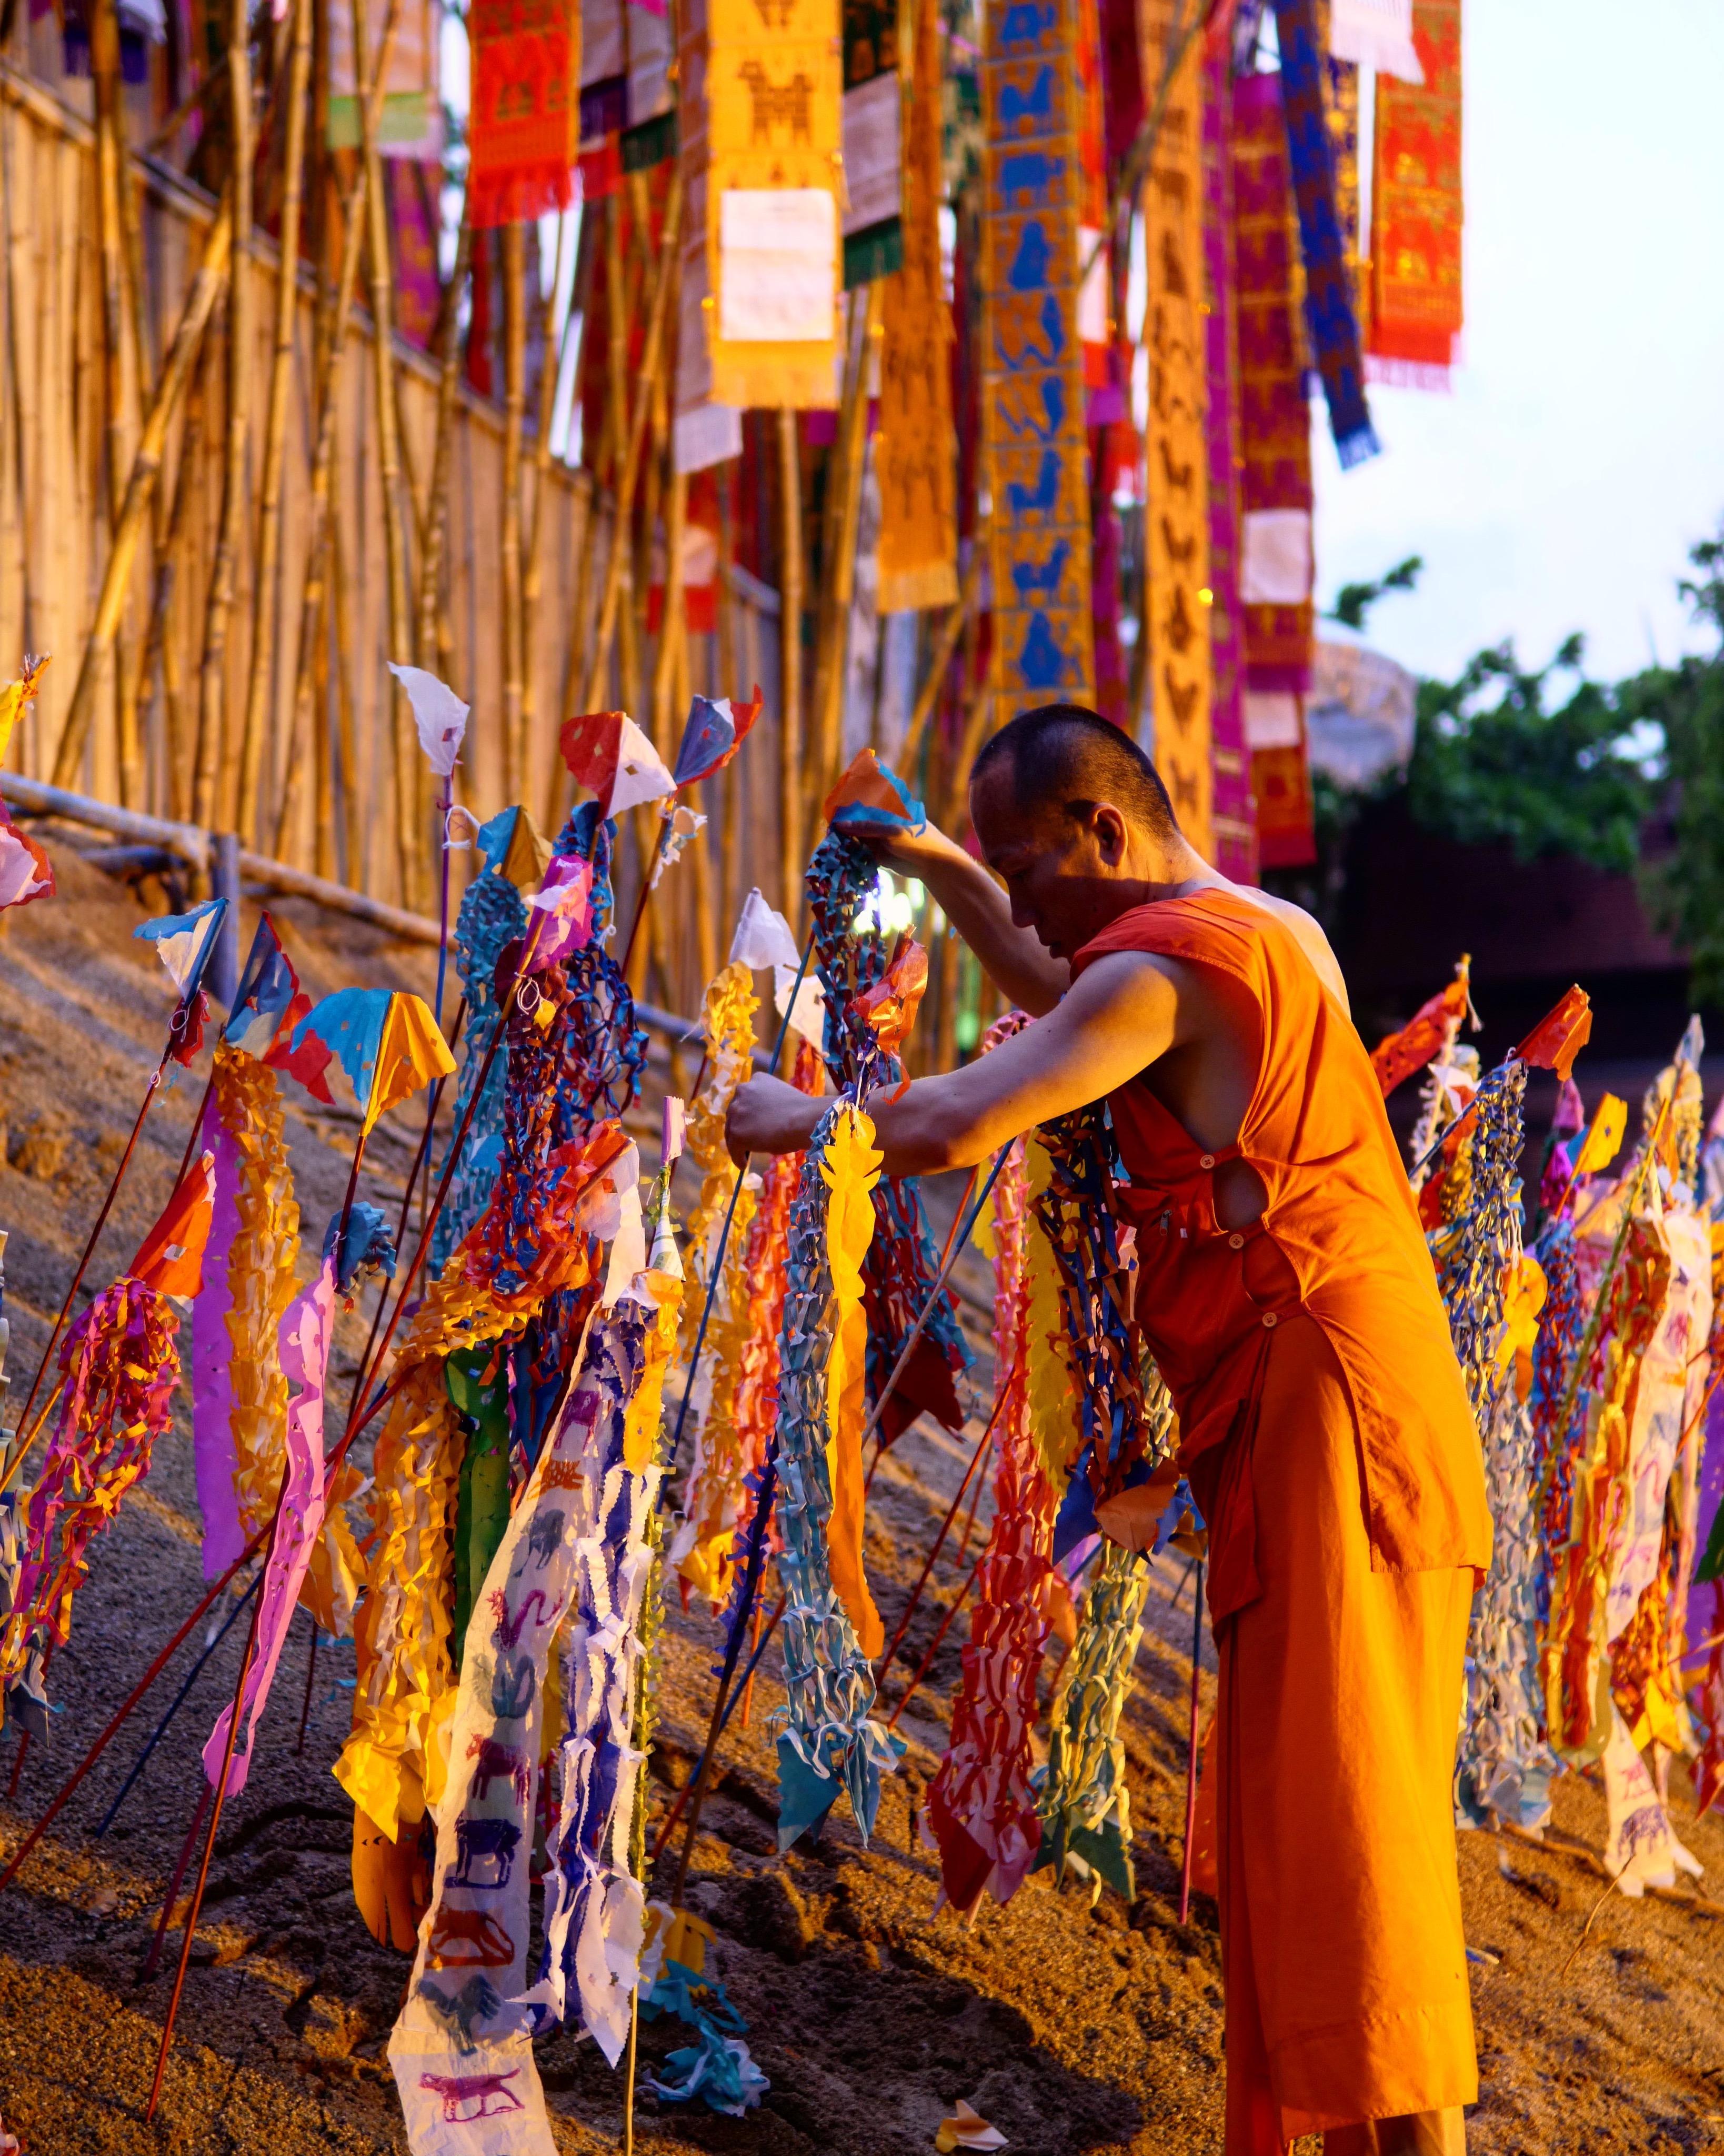 Monk, Songkran Festival